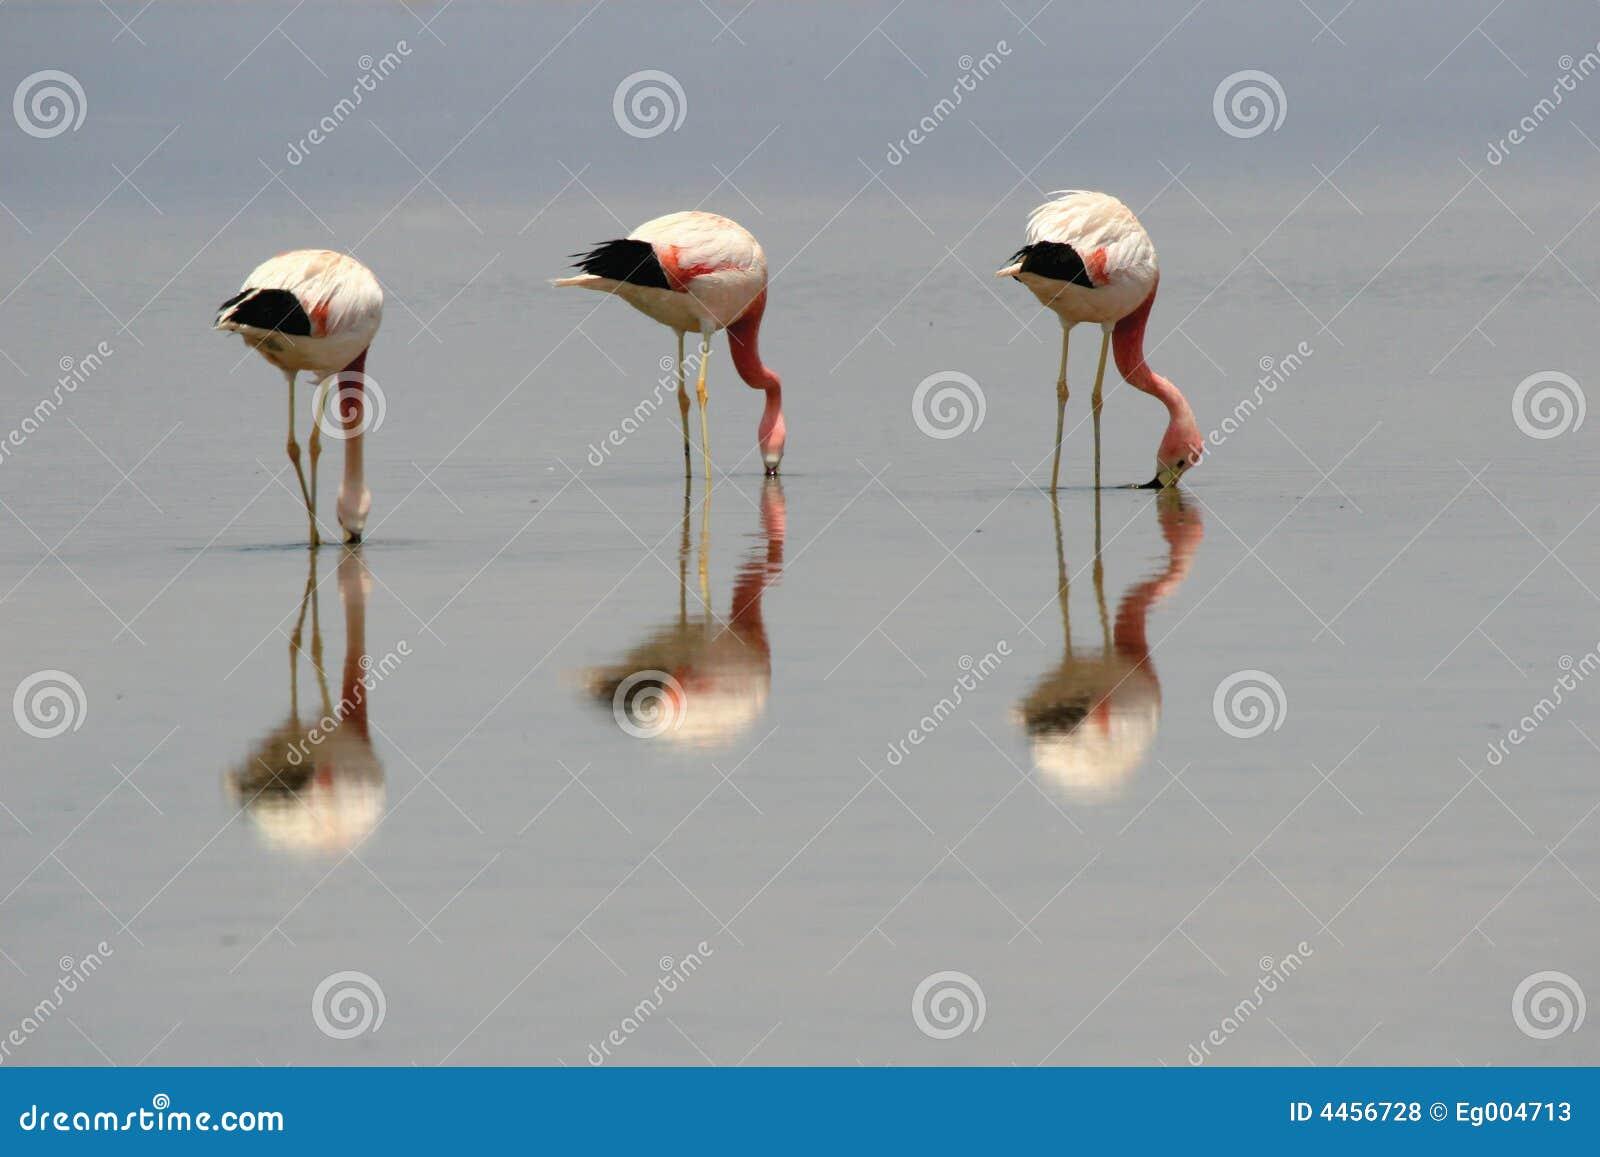 Download Flamingos stock photo. Image of colorful, east, atacama - 4456728